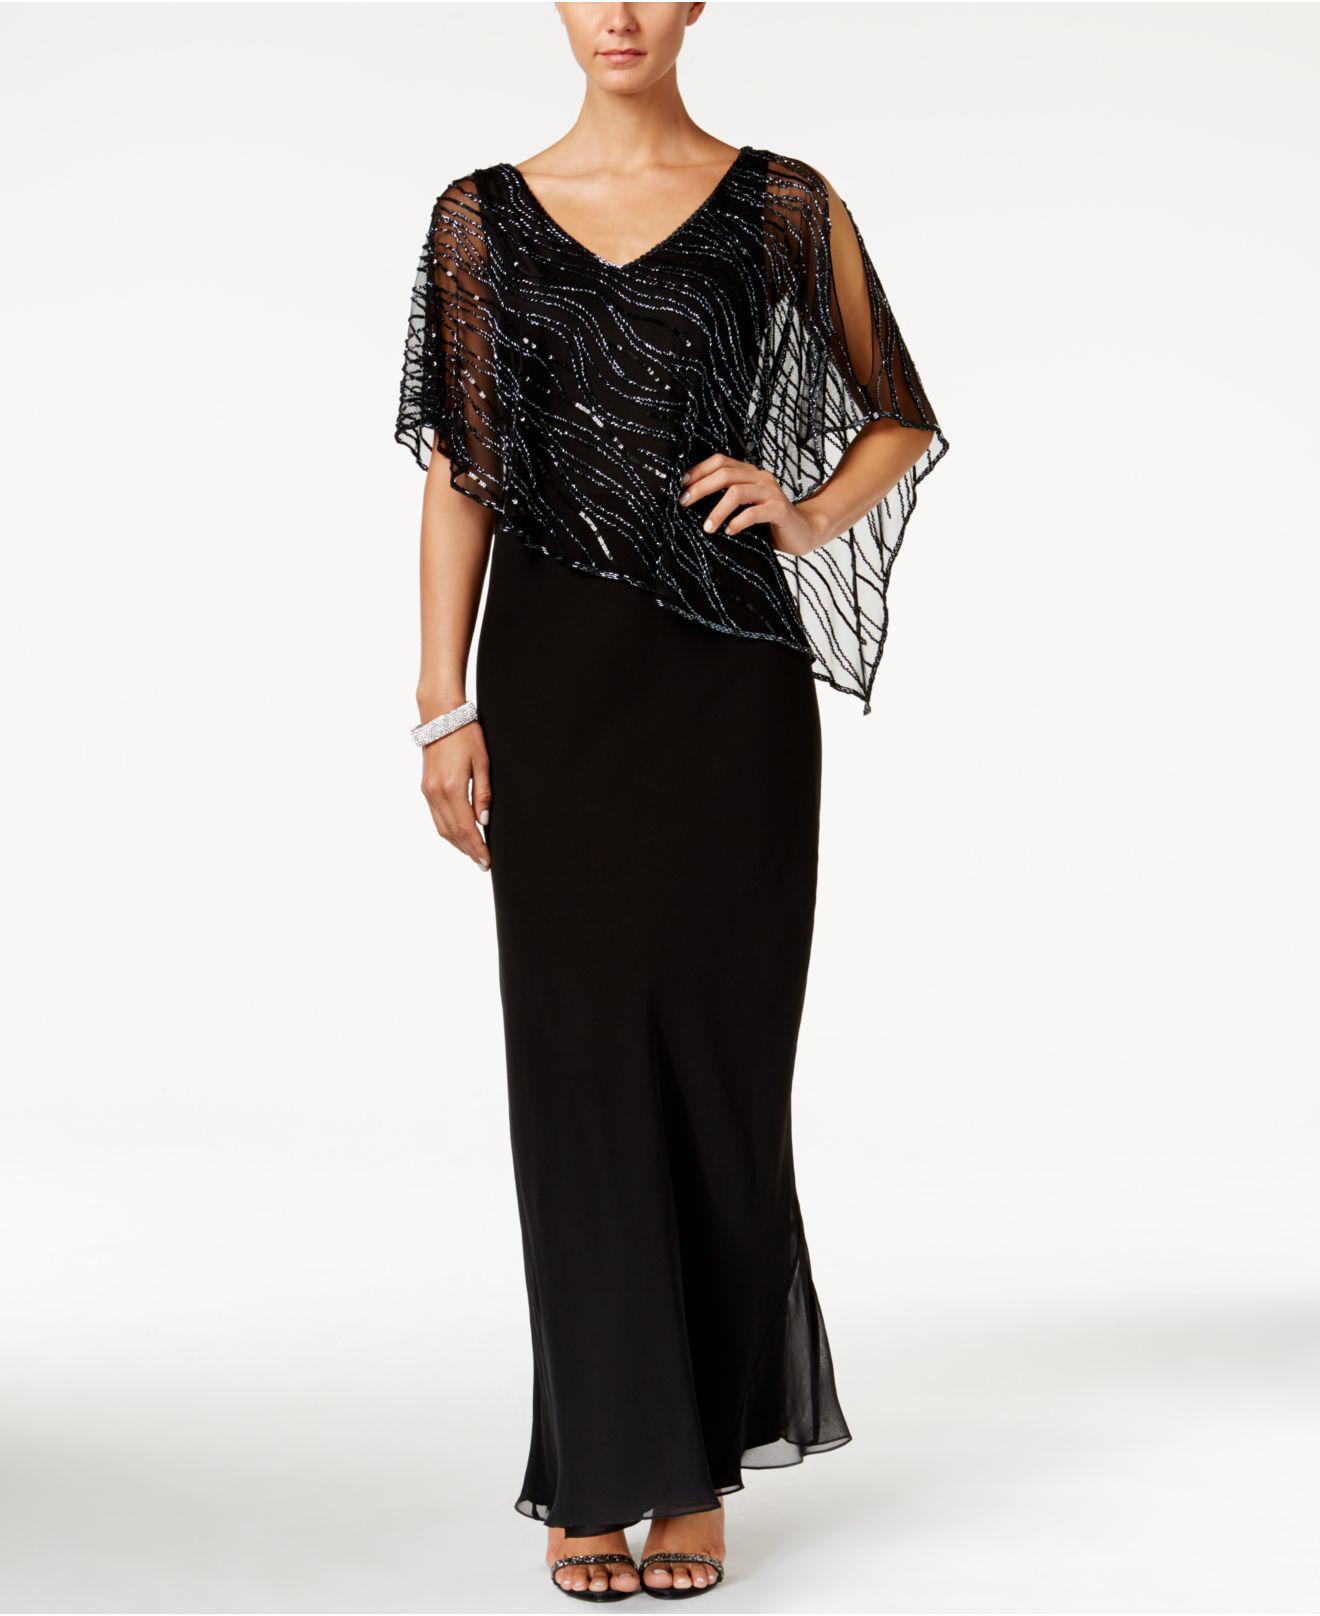 Lyst - J Kara Embellished Illusion-overlay Crepe Gown in Black